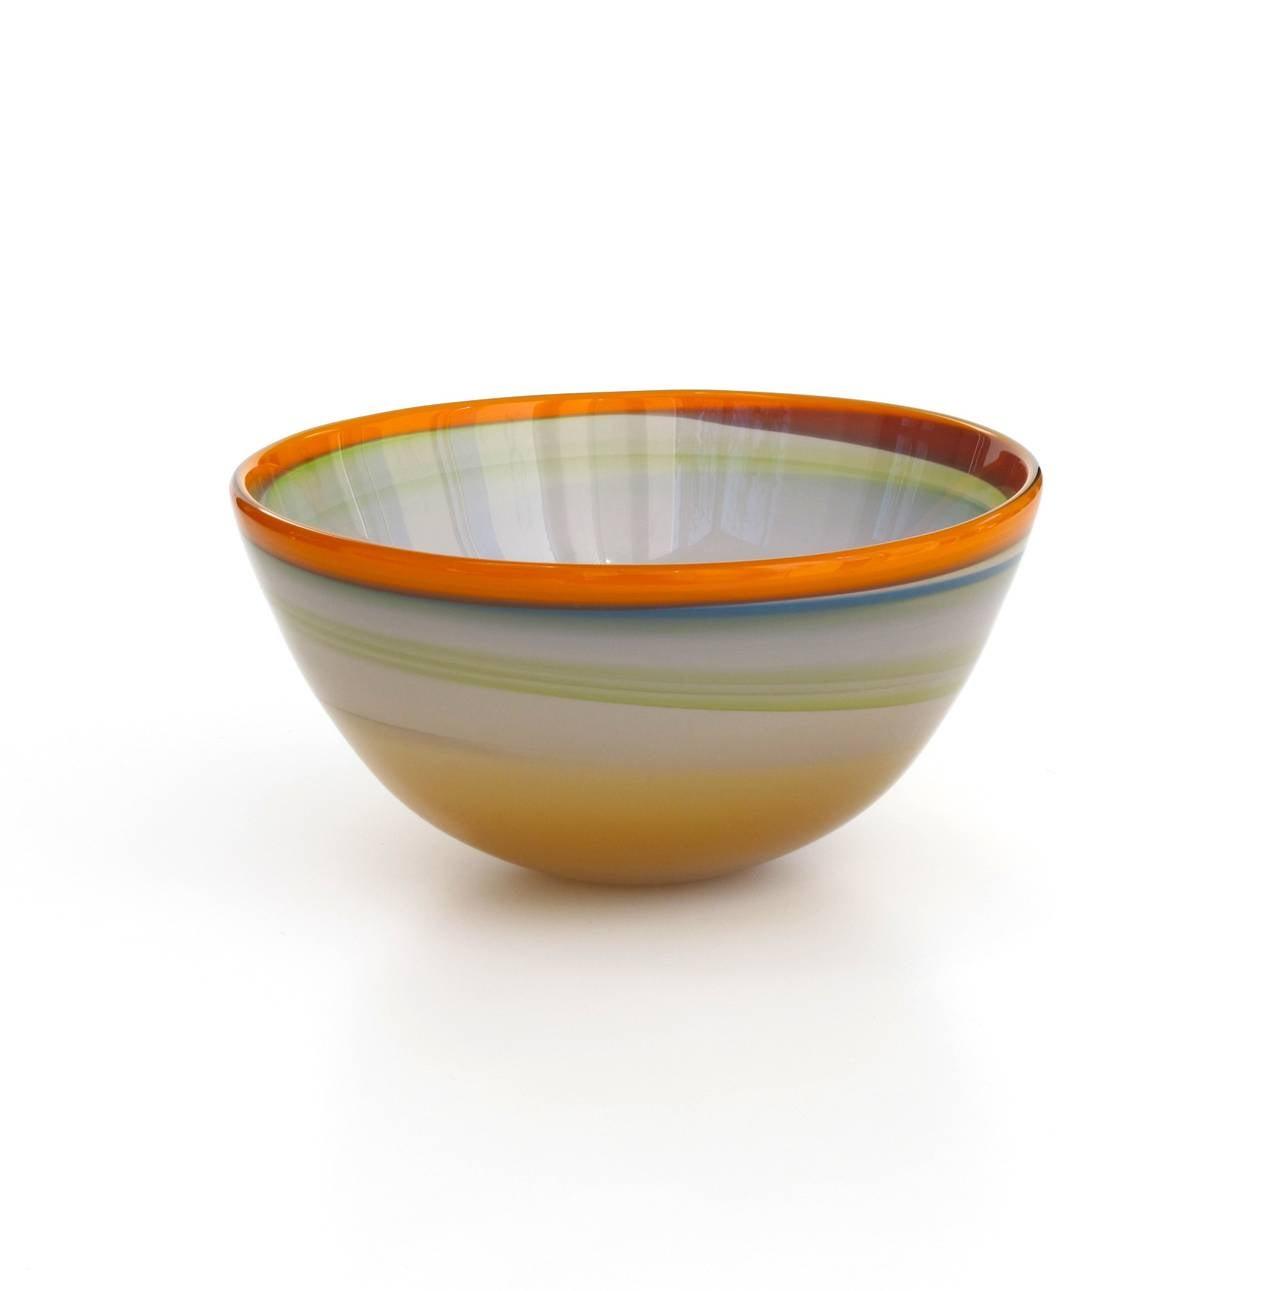 polychrome modern art glass bowl by misha ignis at stdibs - polychrome modern art glass bowl by misha ignis